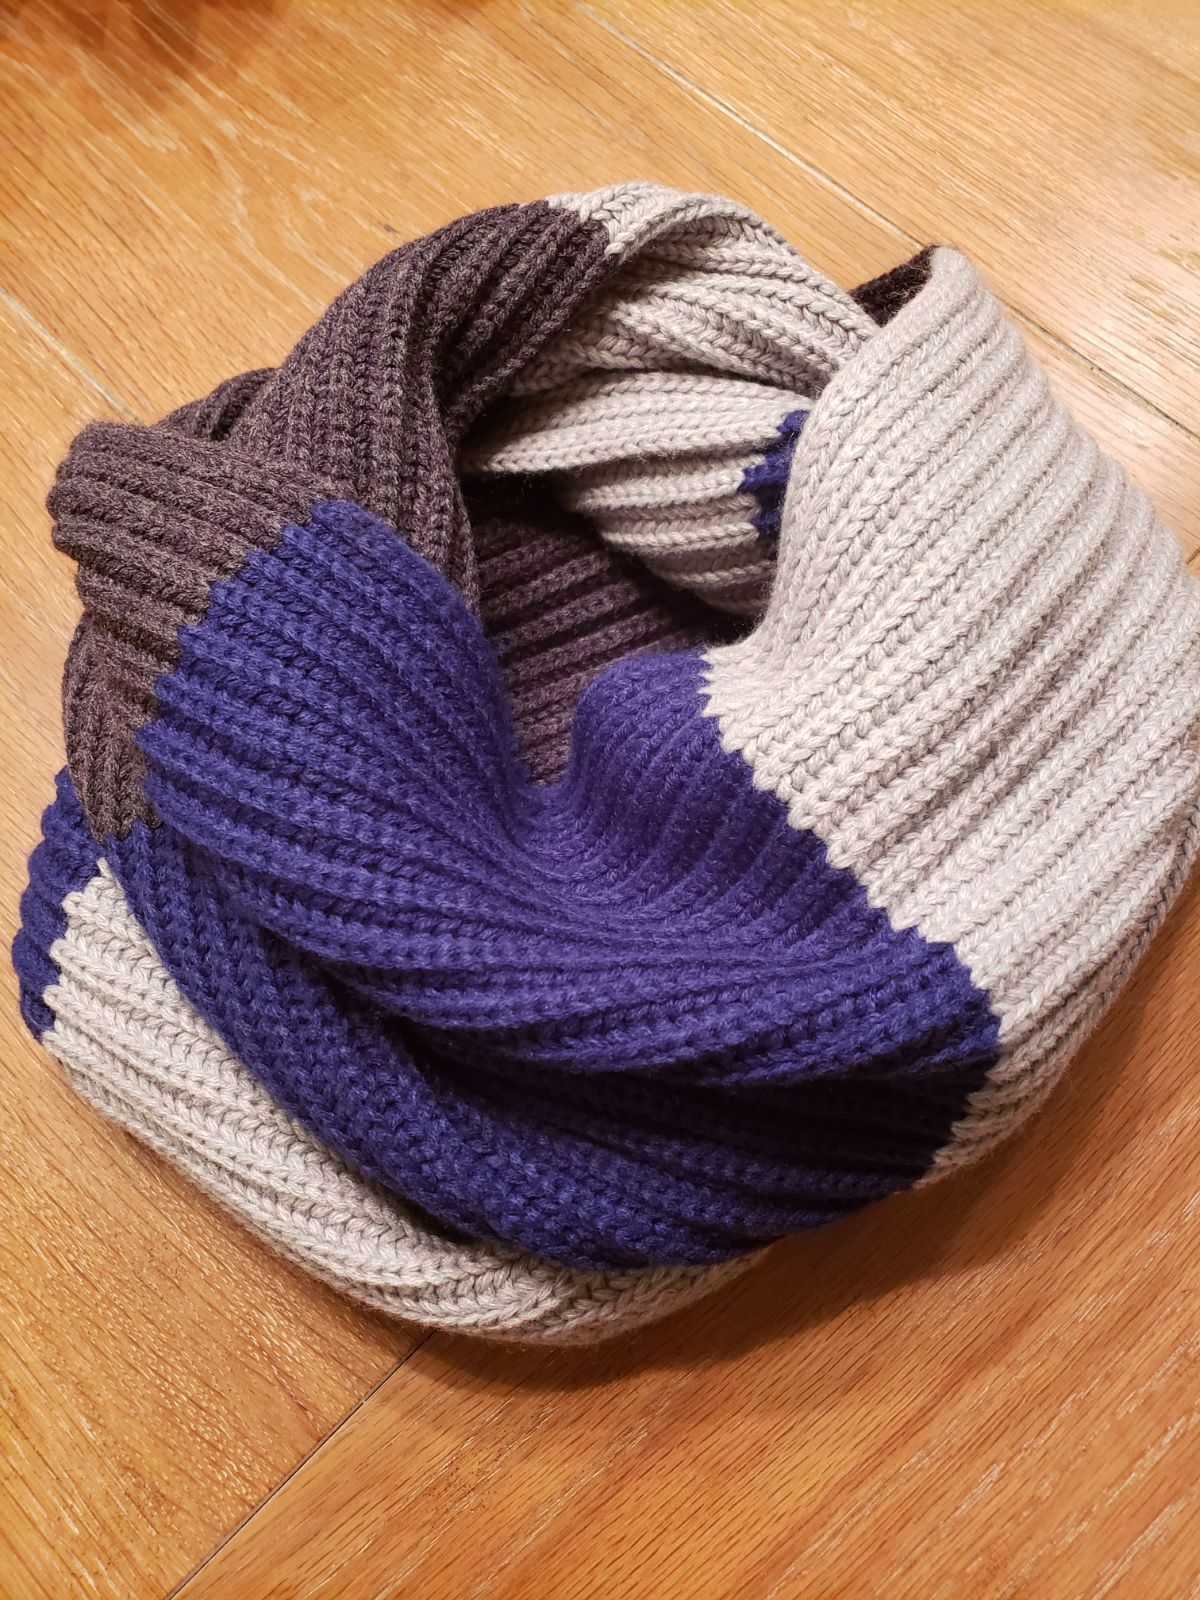 MICHAEL KORS  Knit Infinity Scarf